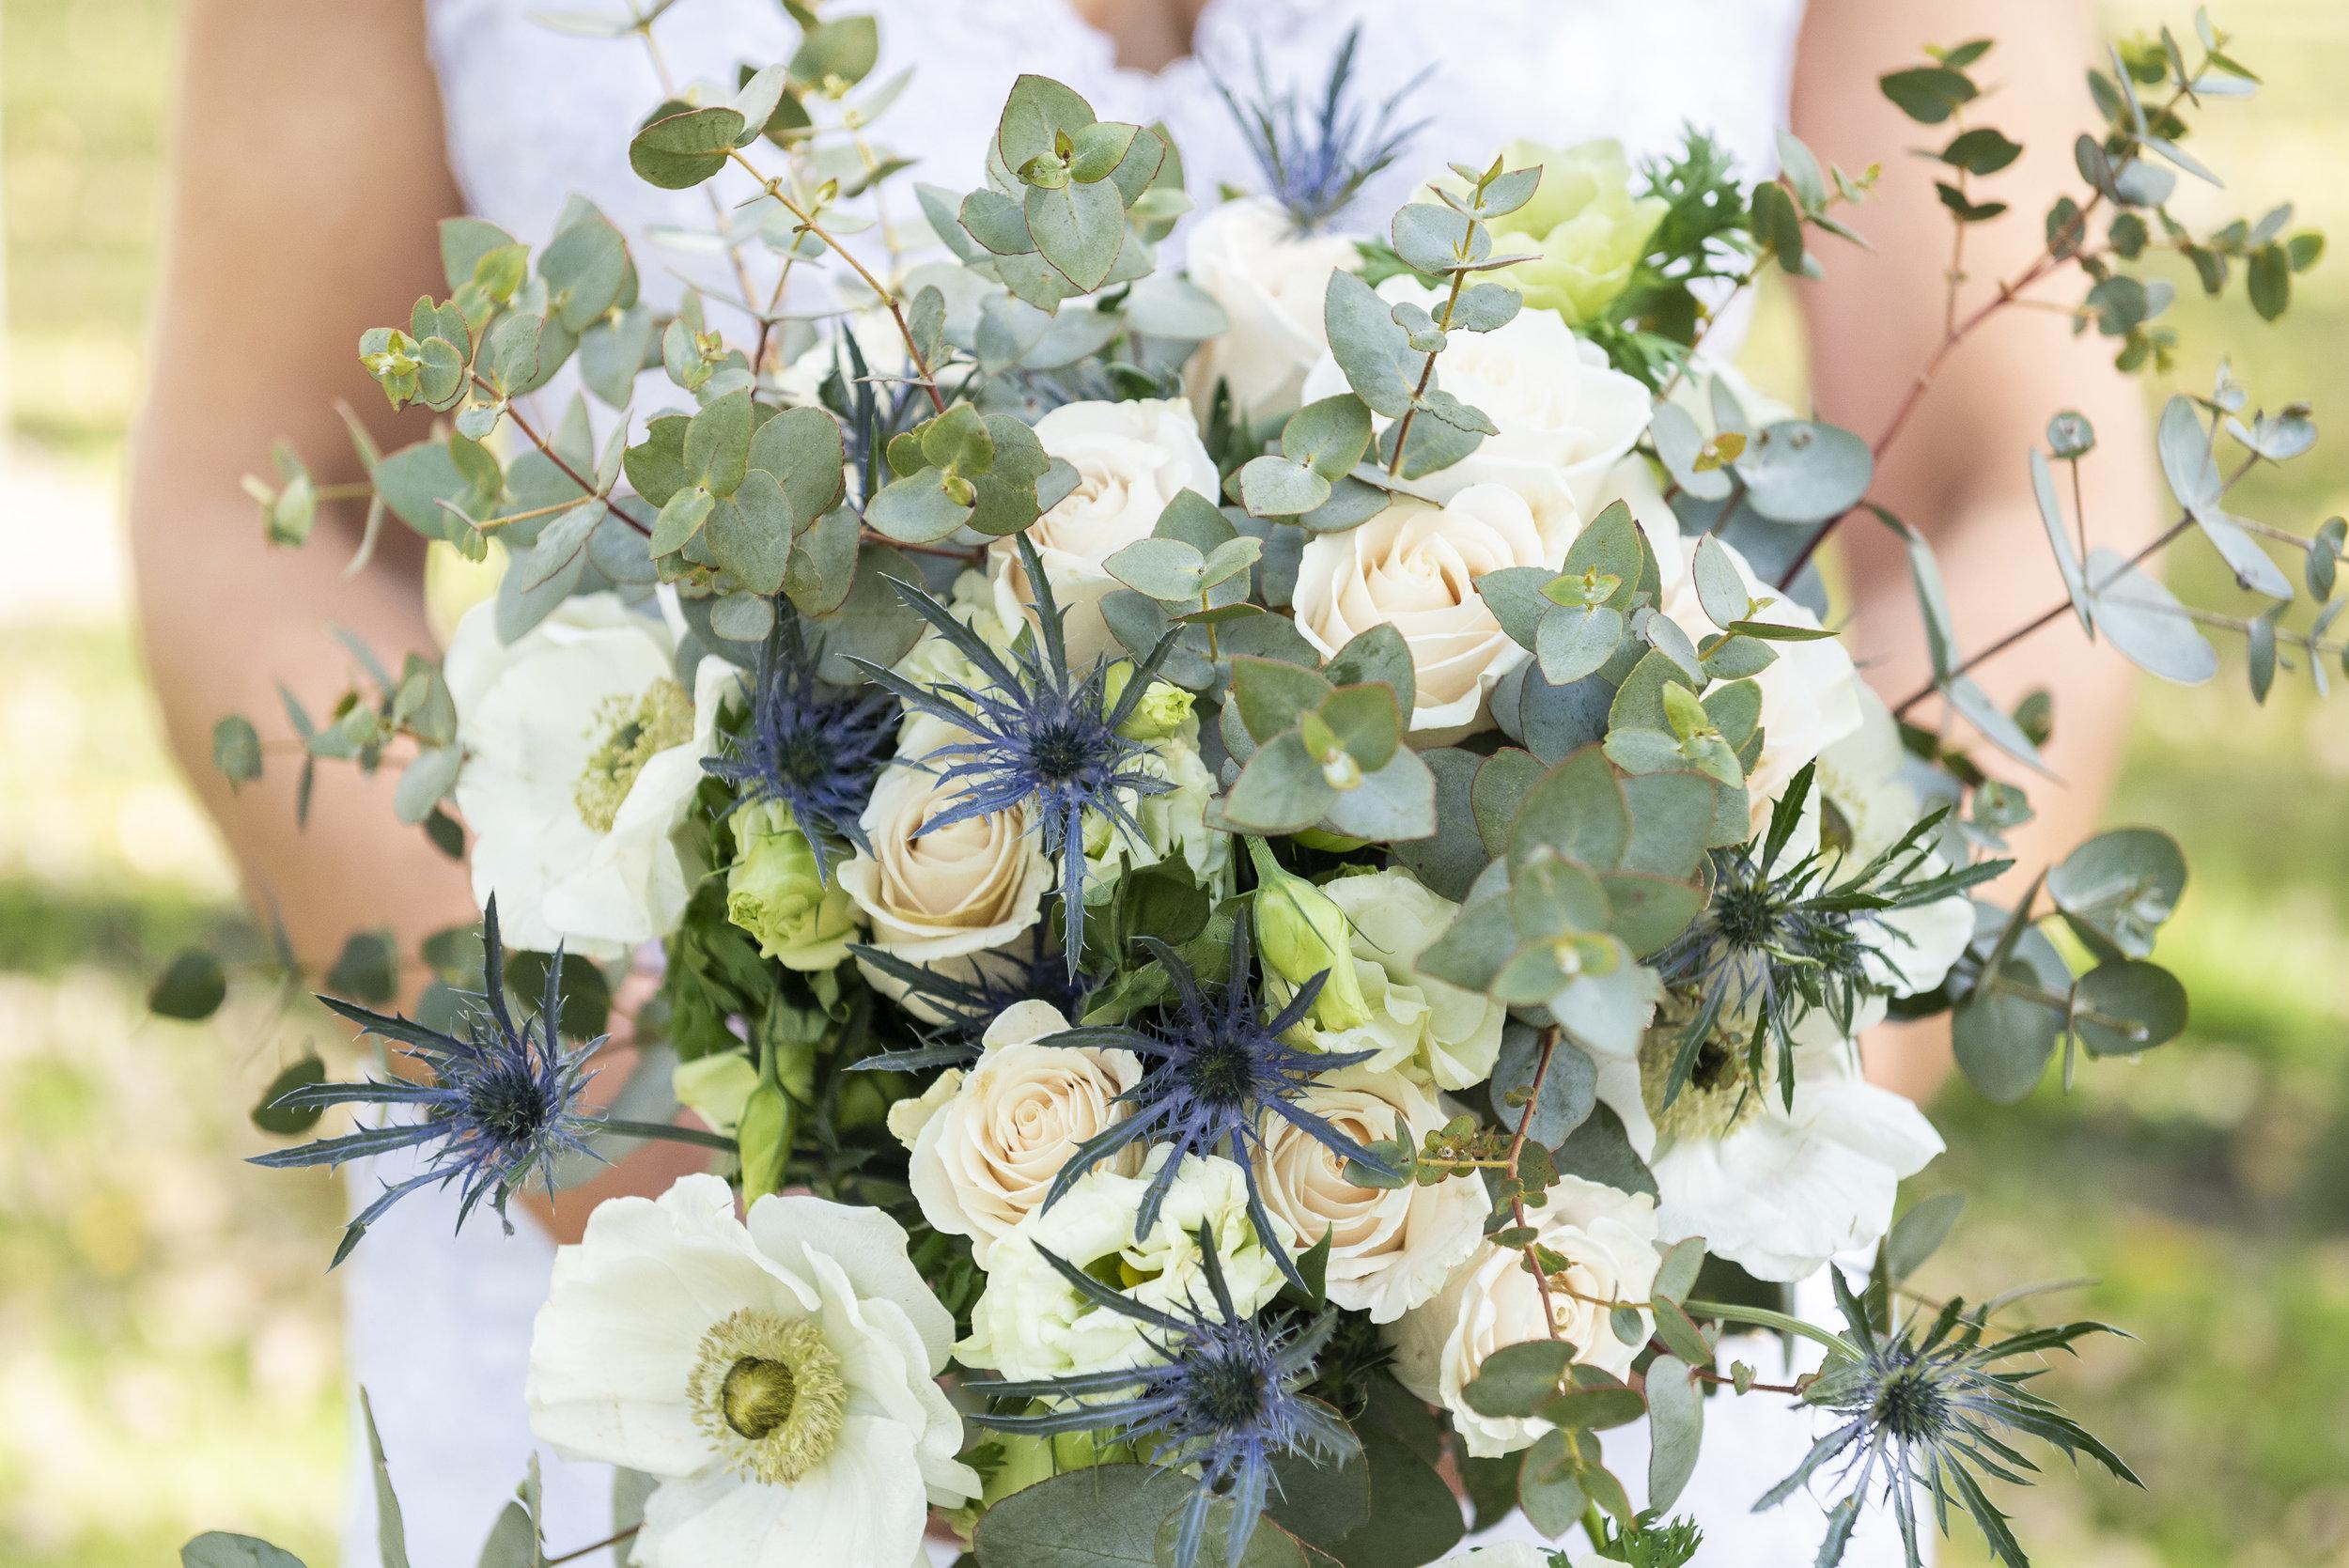 weddings by atelier photography-wedding-15.jpg